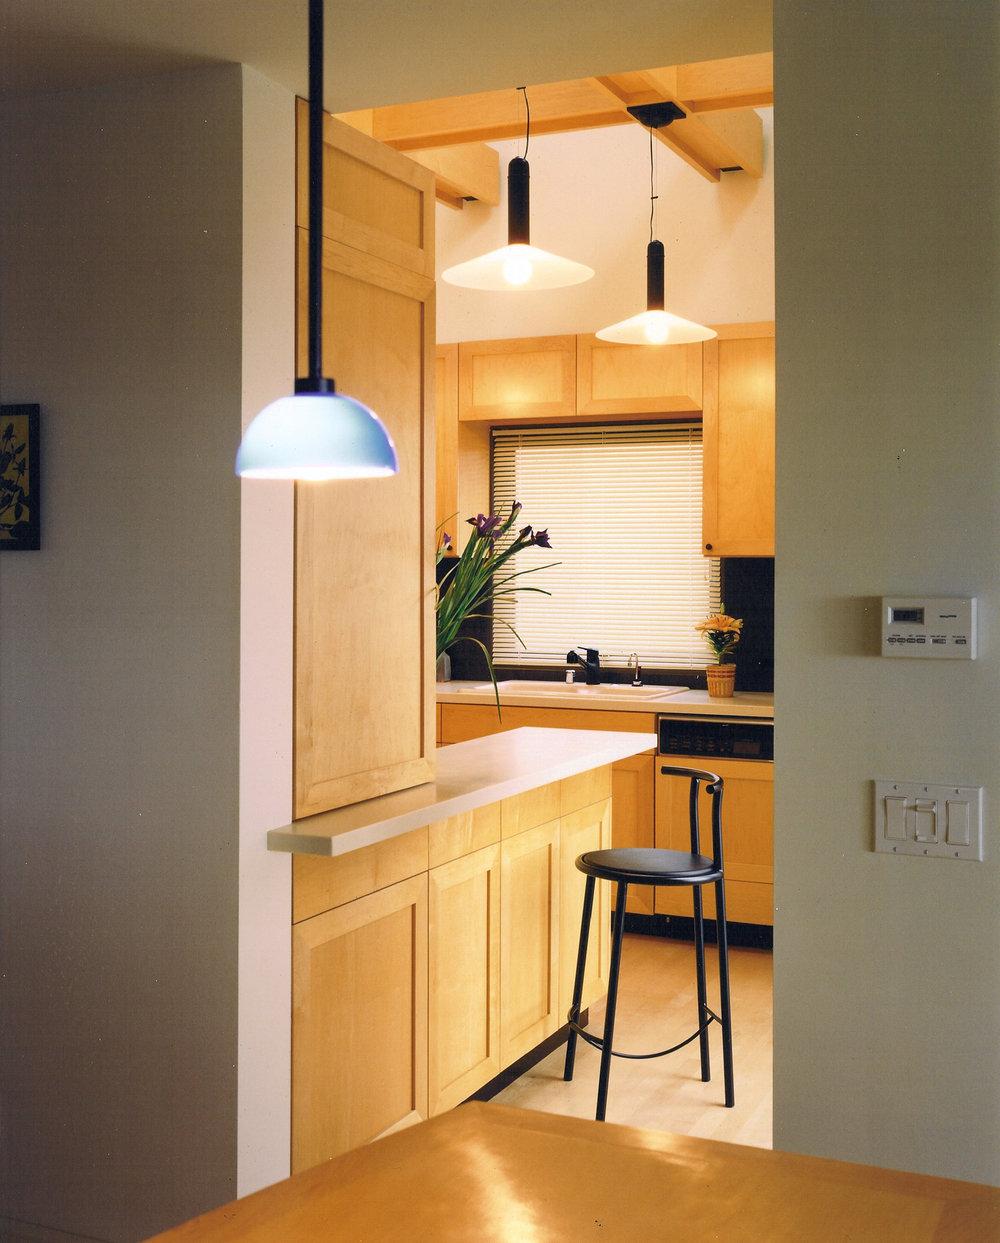 Kaplan-Architects-new-modern-hillside-house-kitchen-1.jpg